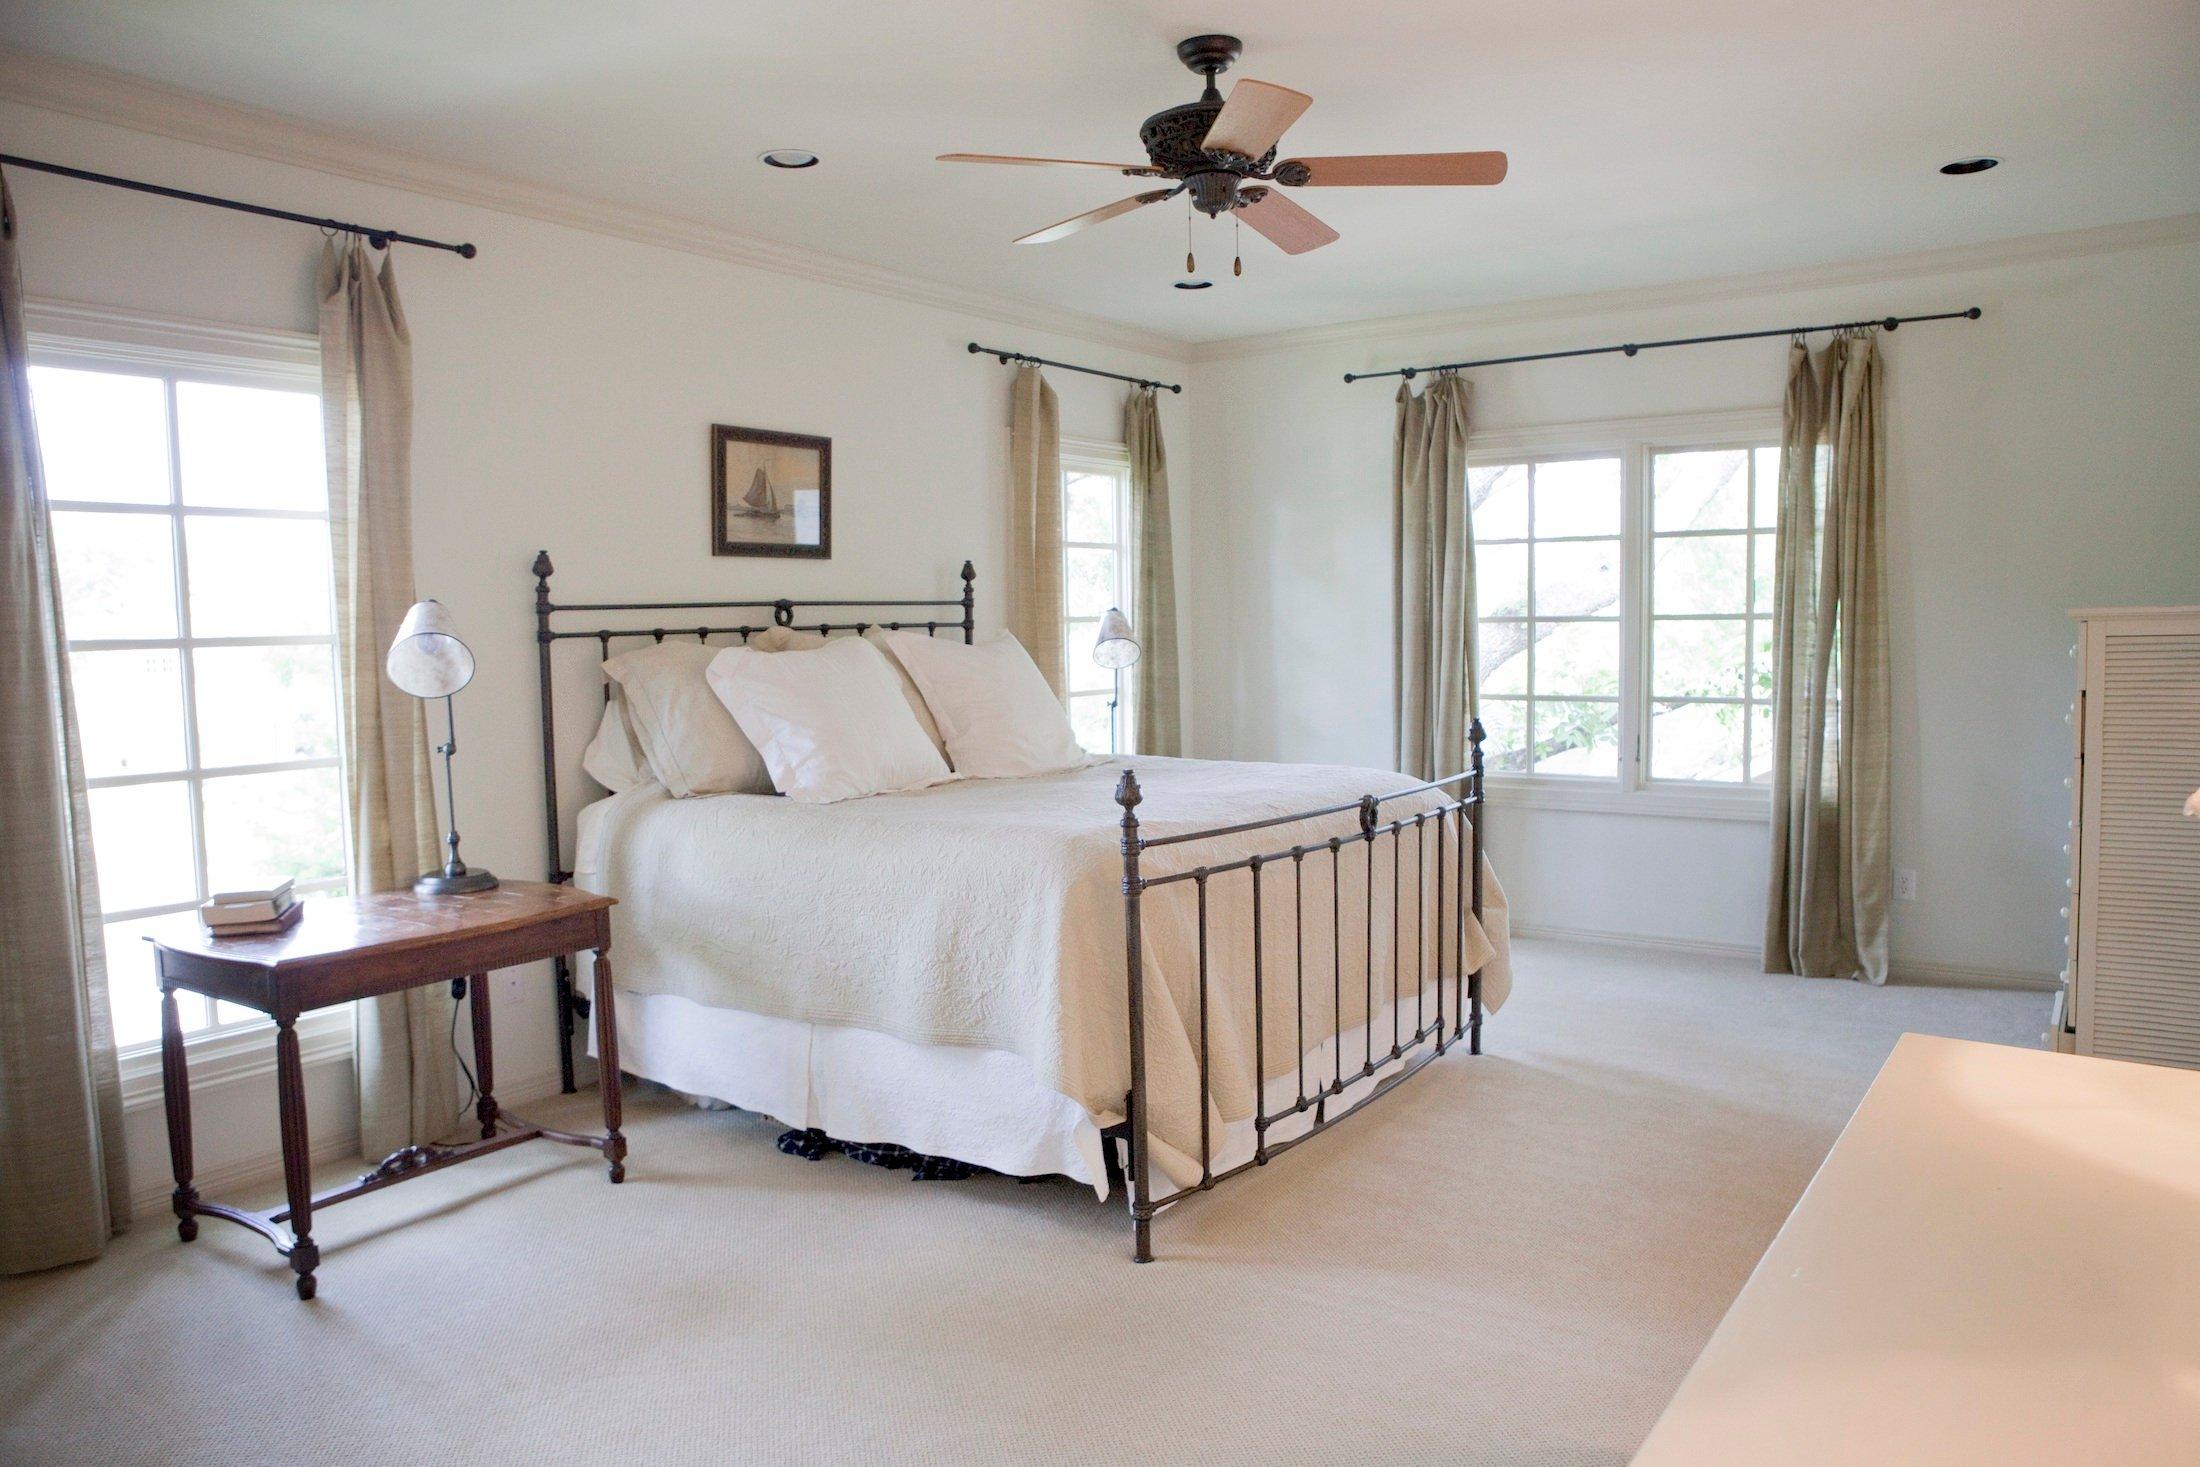 Bedroom Custom Home Design (Texas Homes): Large Upstairs Bedroom With Wood Windows